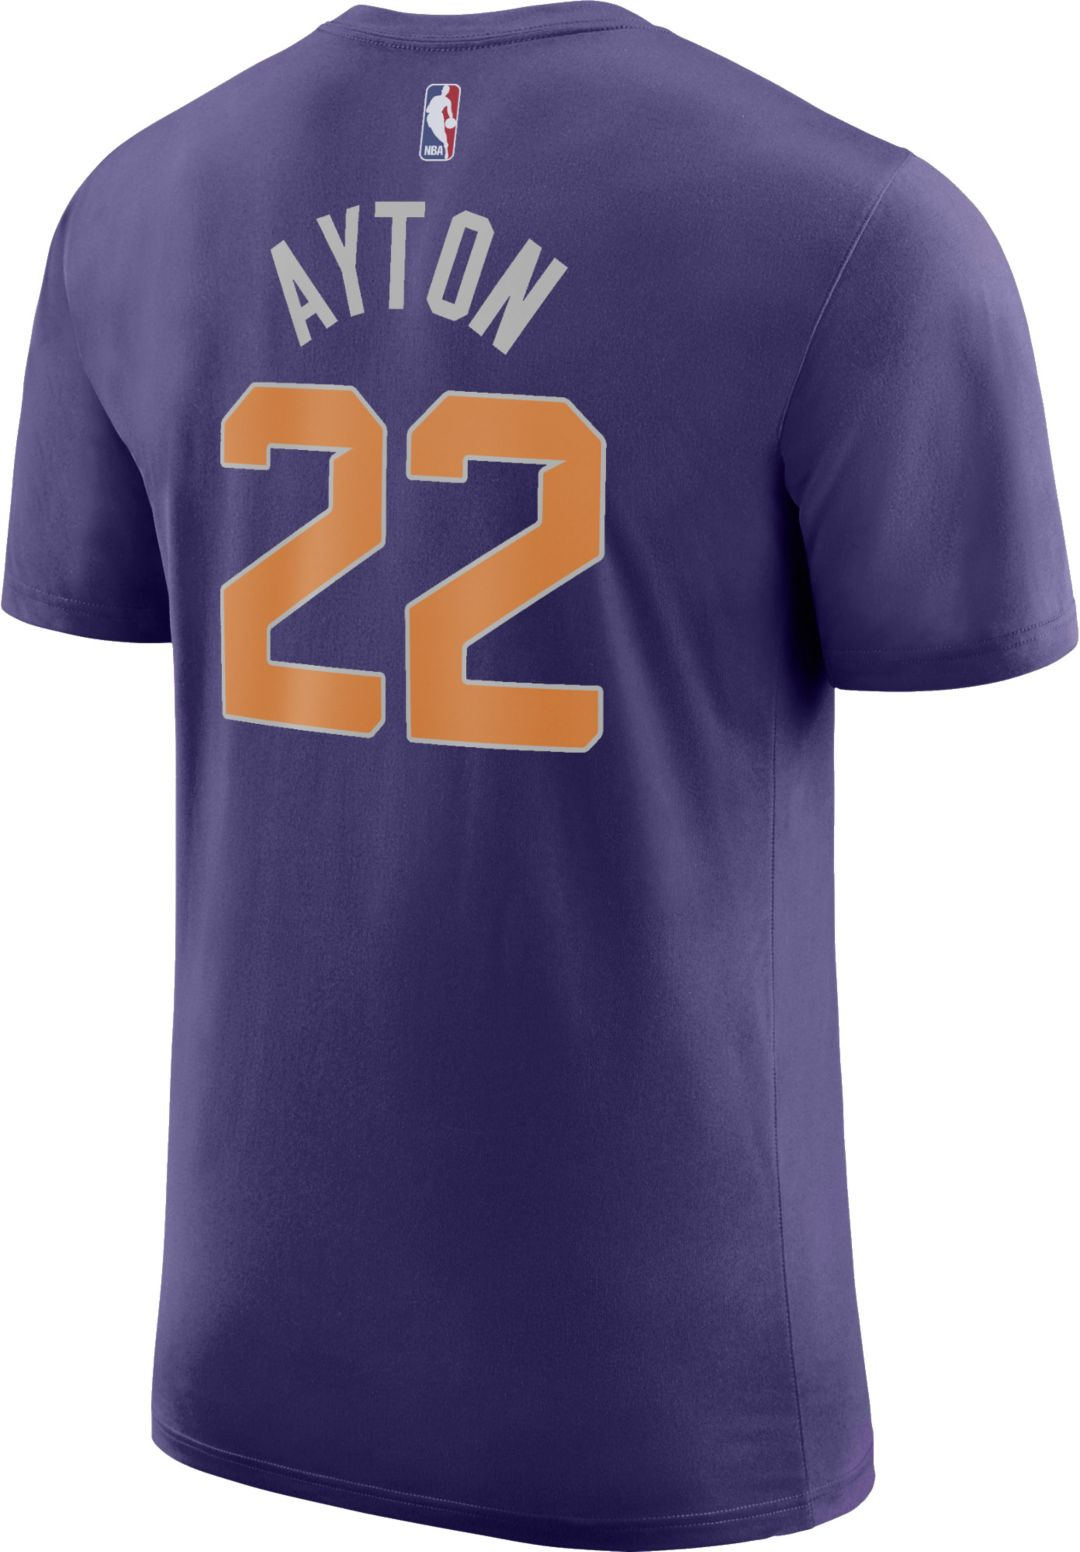 buy online 9c260 2f7b3 Nike Youth Phoenix Suns DeAndre Ayton #22 Dri-FIT Purple T-Shirt